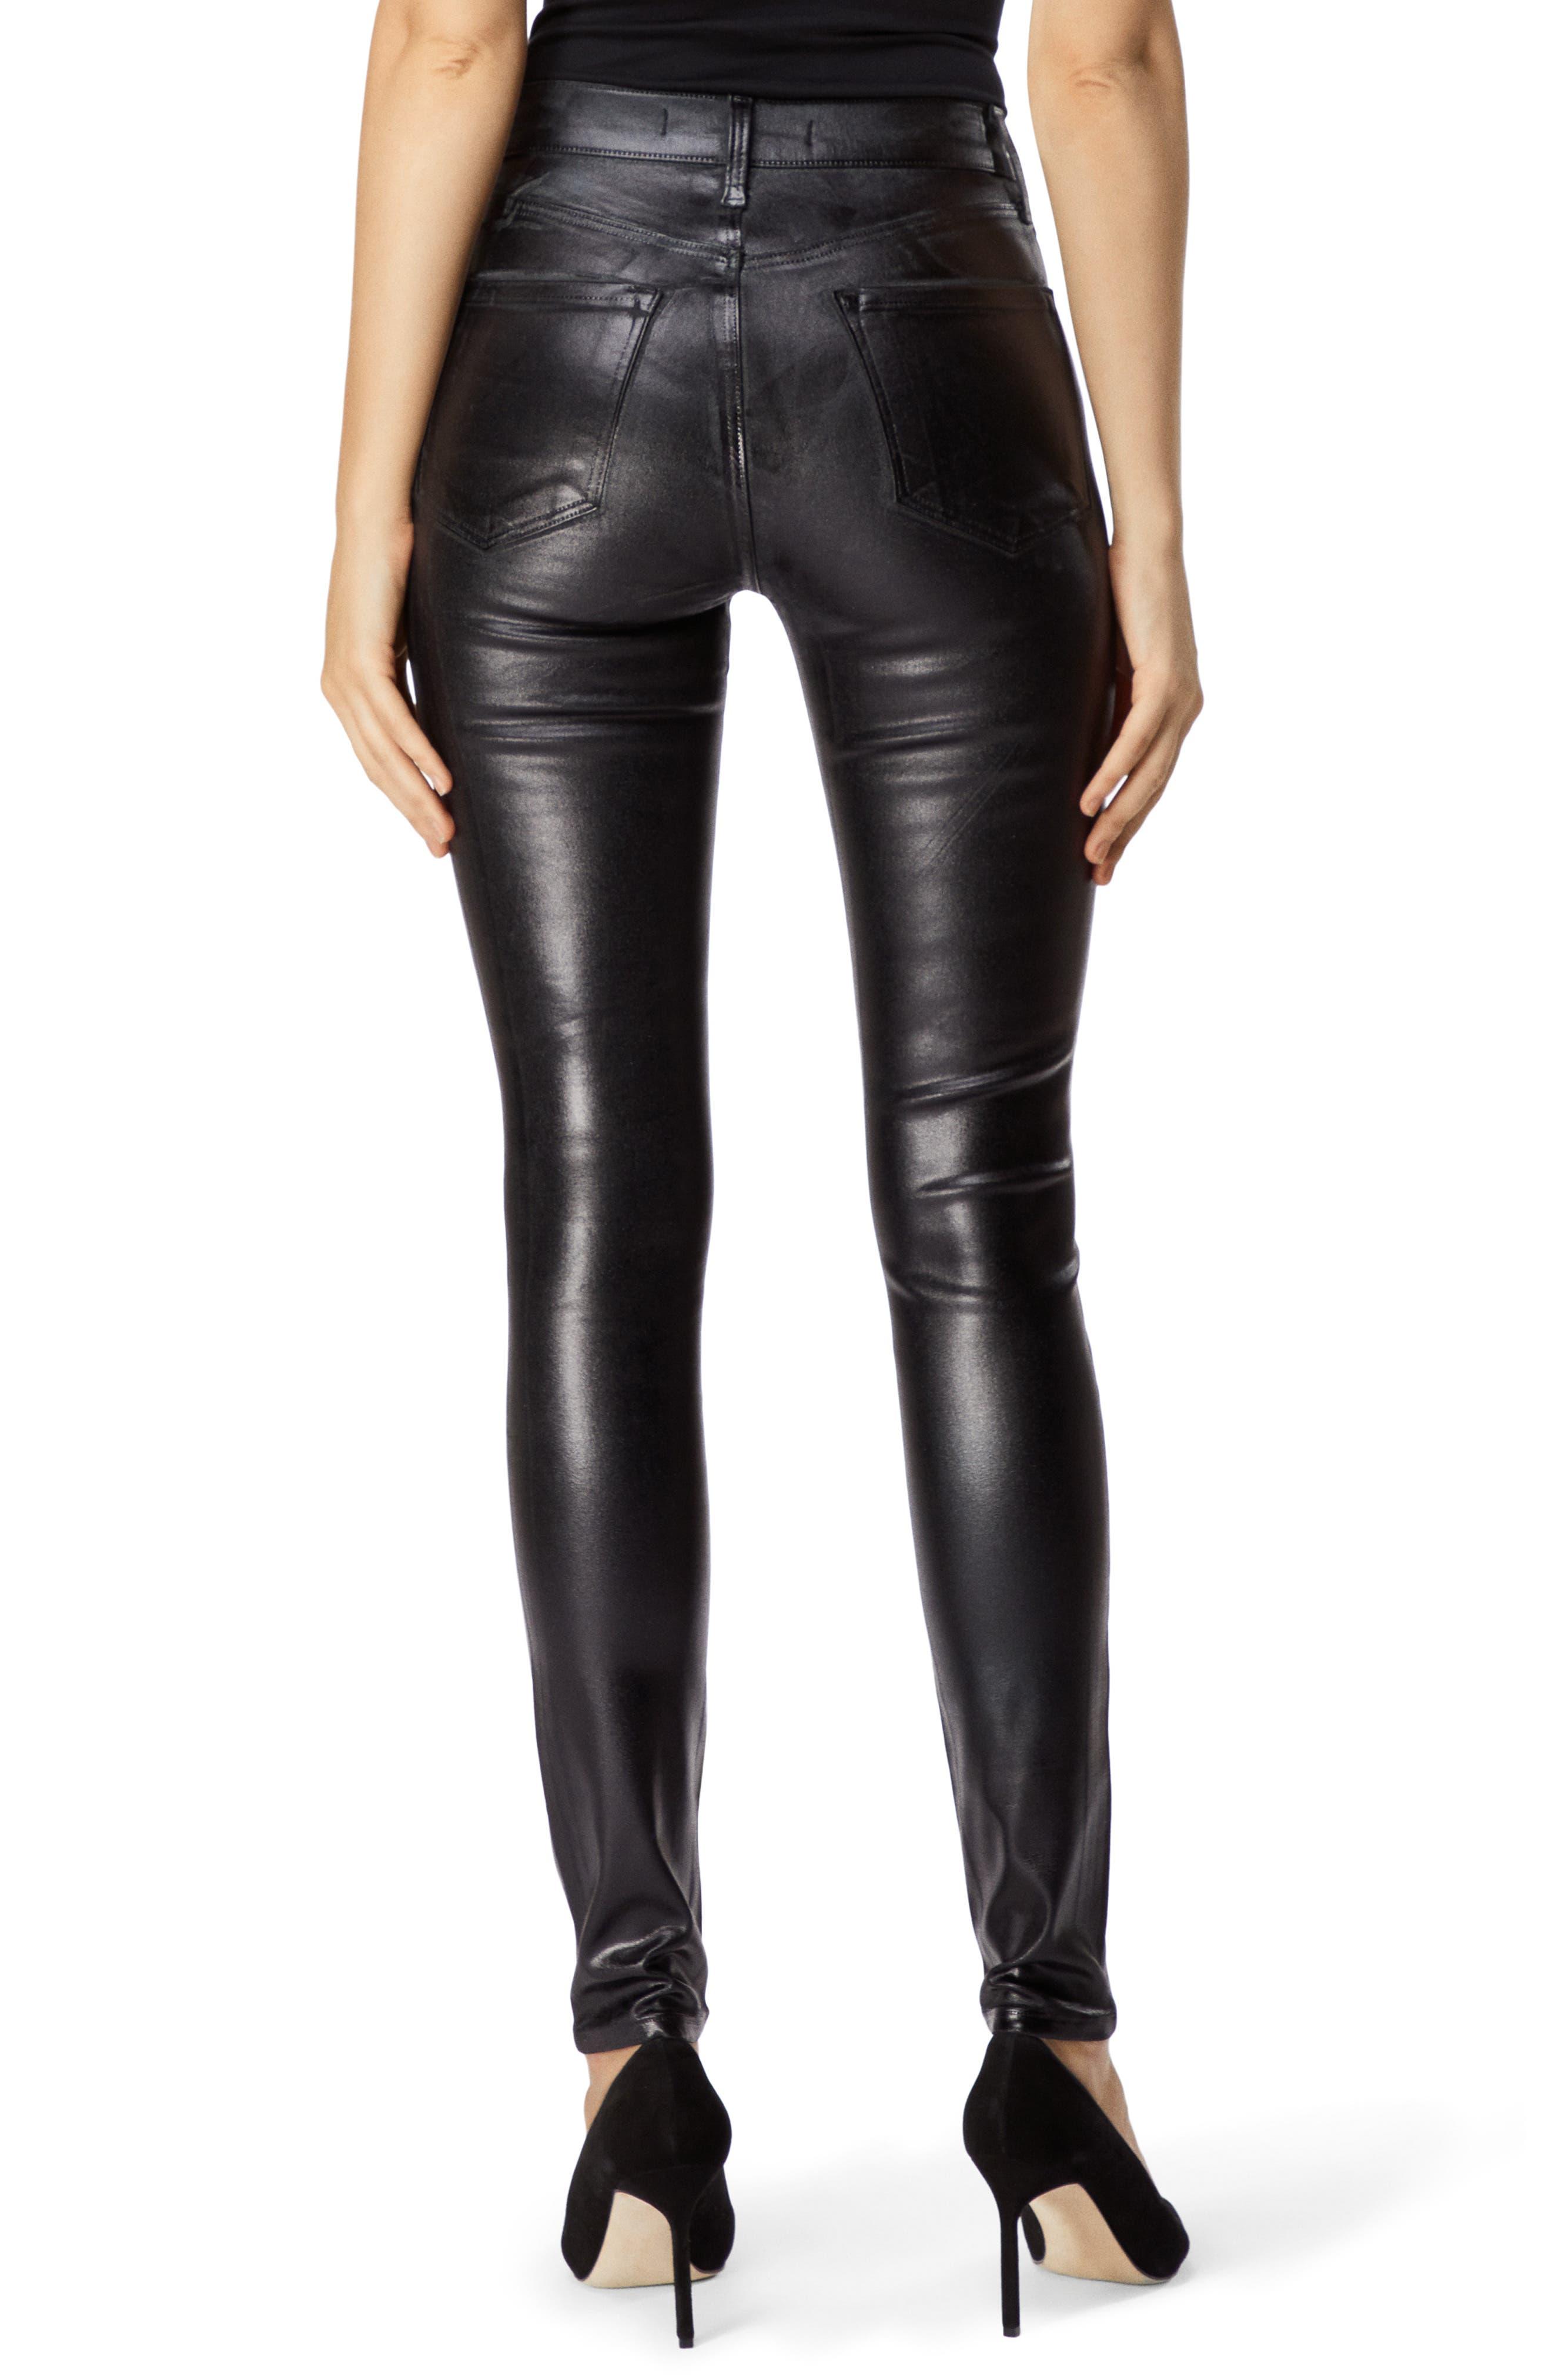 Maria Coated High Waist Skinny Jeans,                             Alternate thumbnail 2, color,                             009